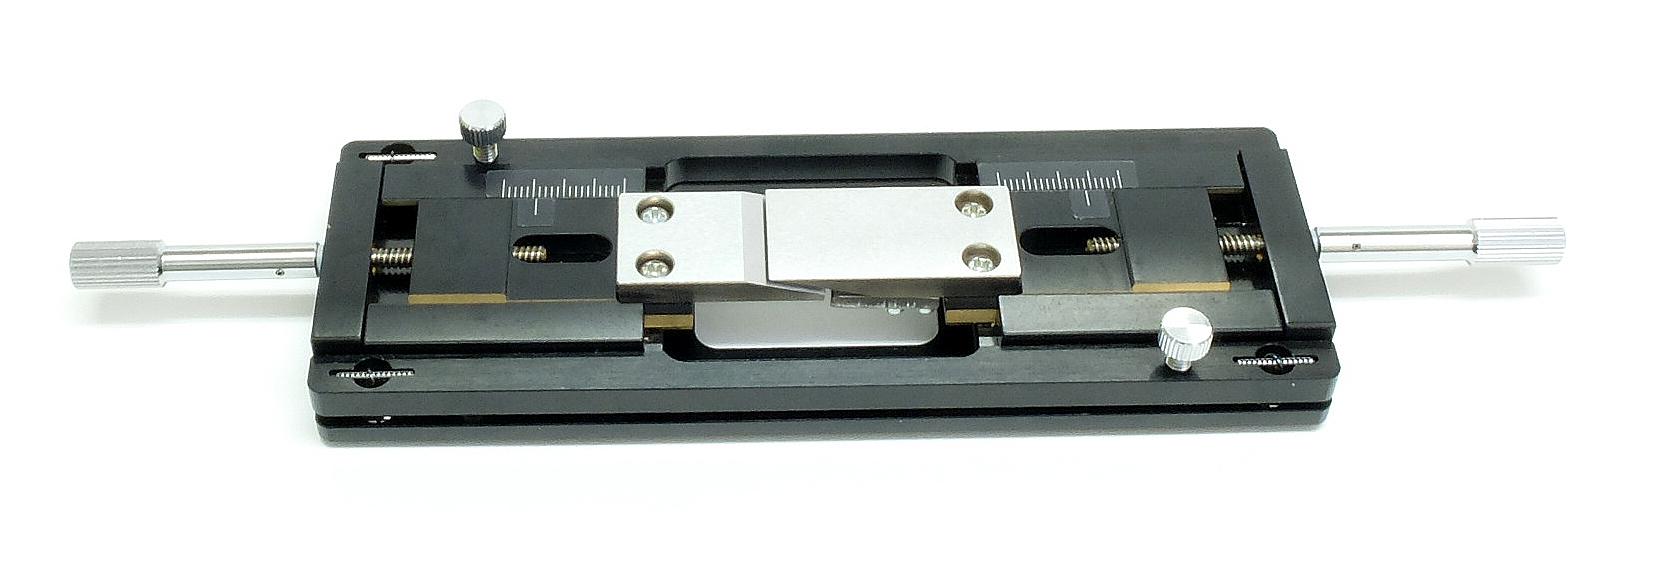 Microvice SliceIR